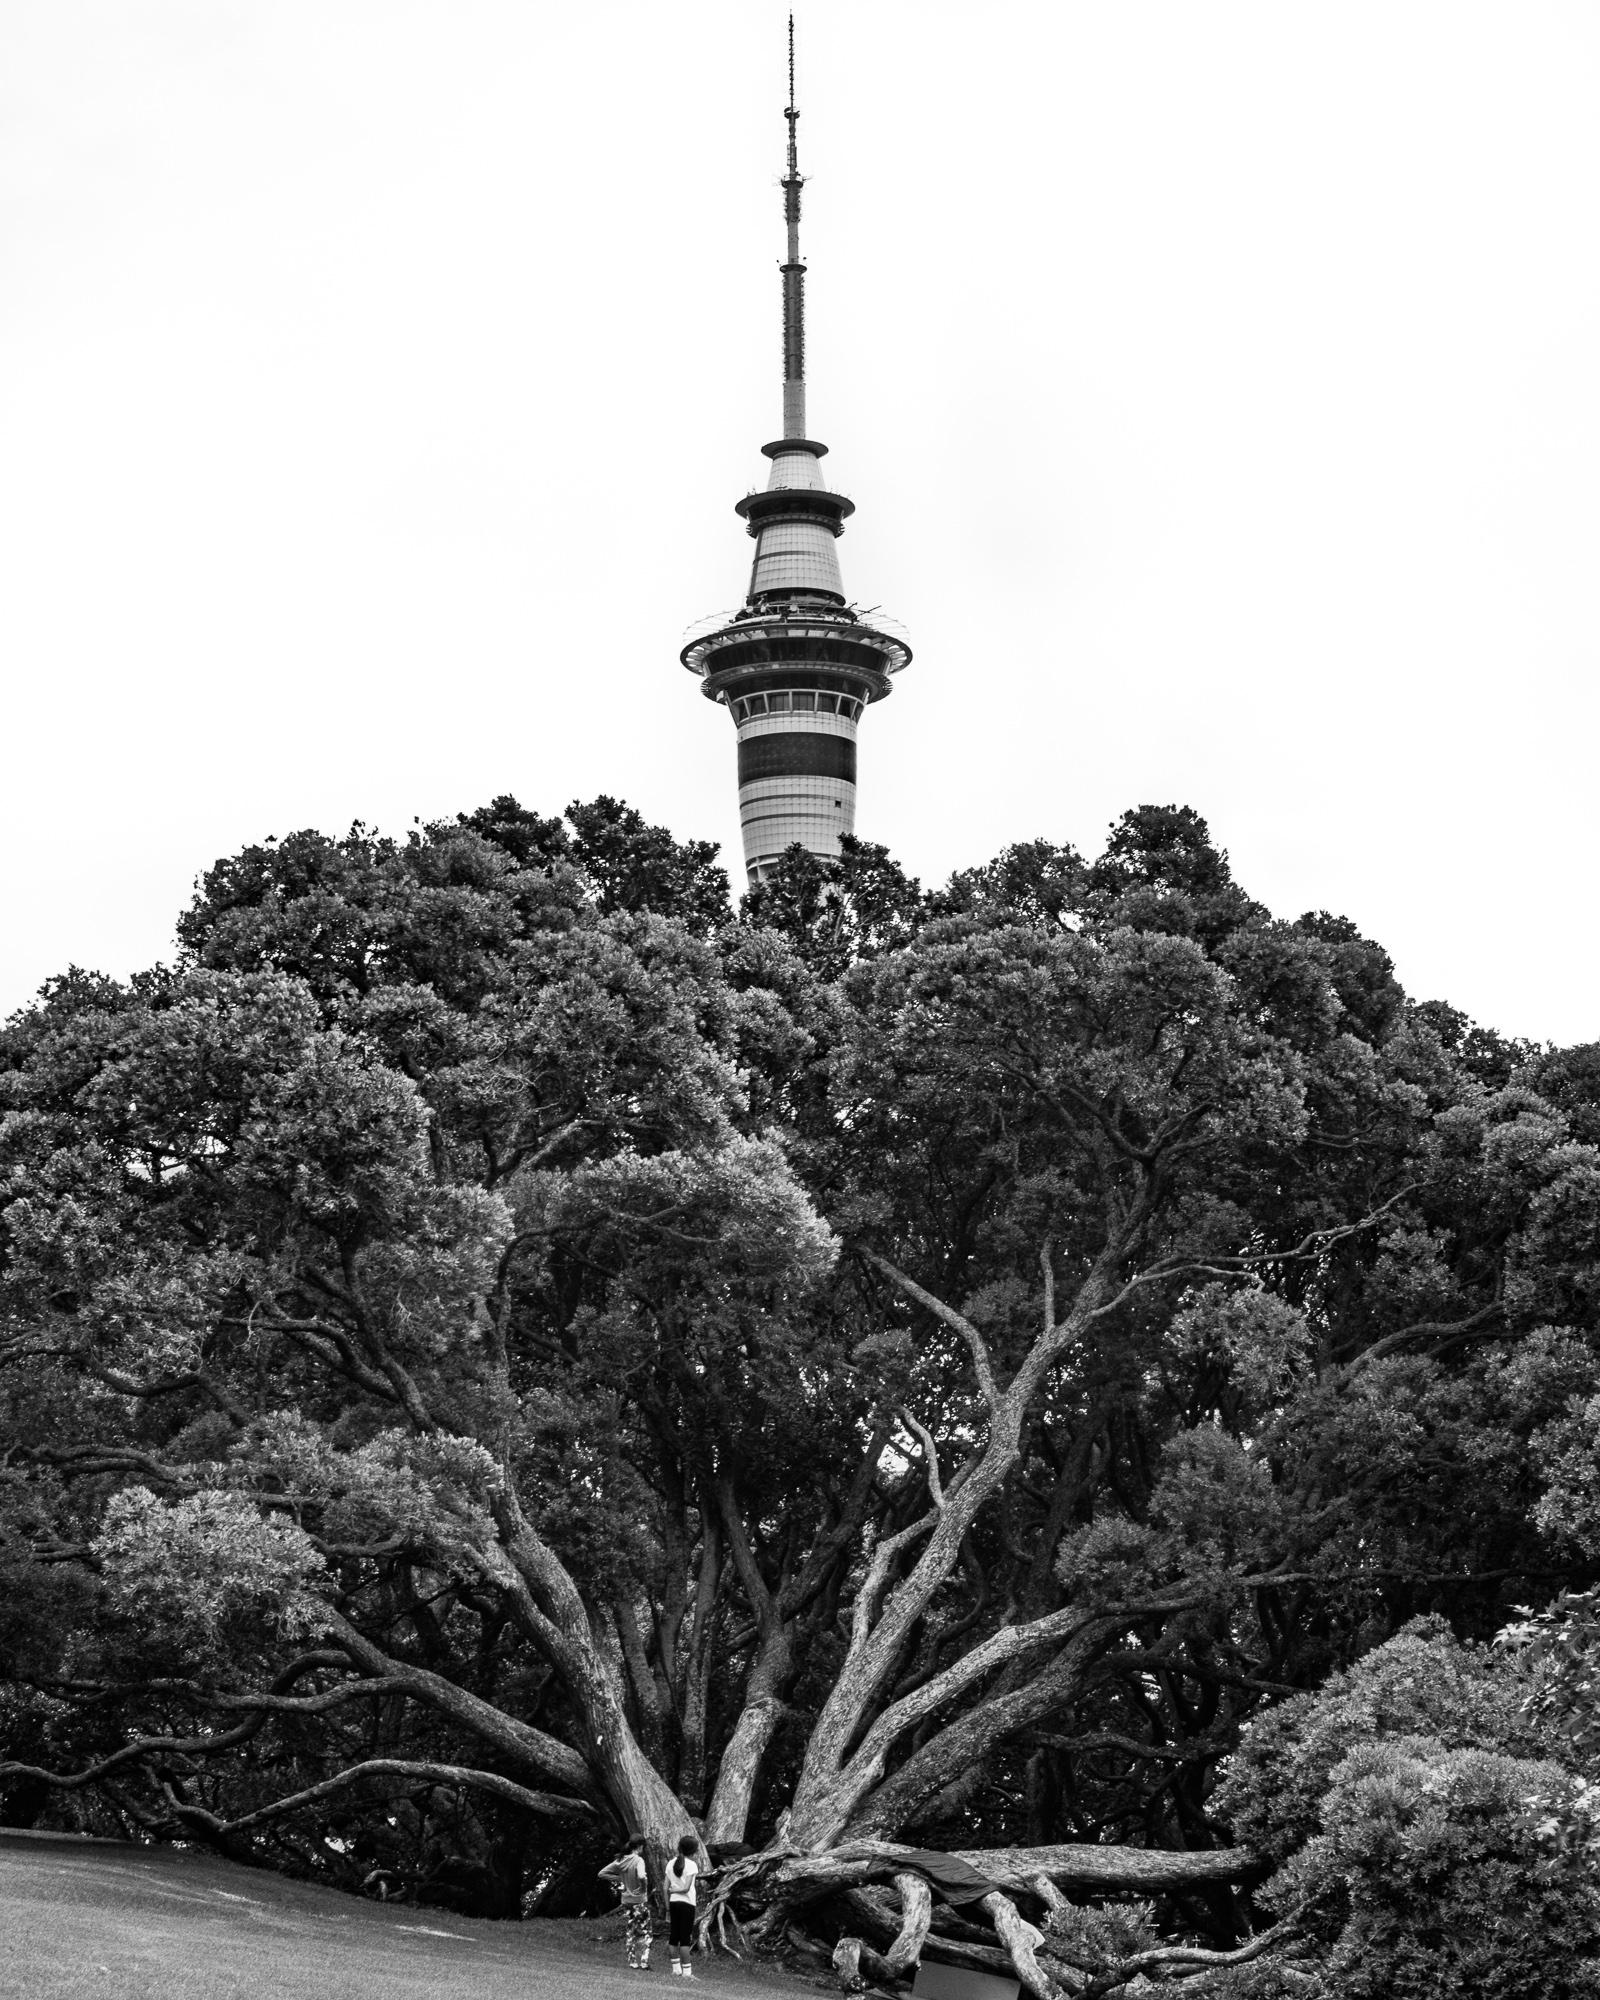 Sky Tower from Albert Park